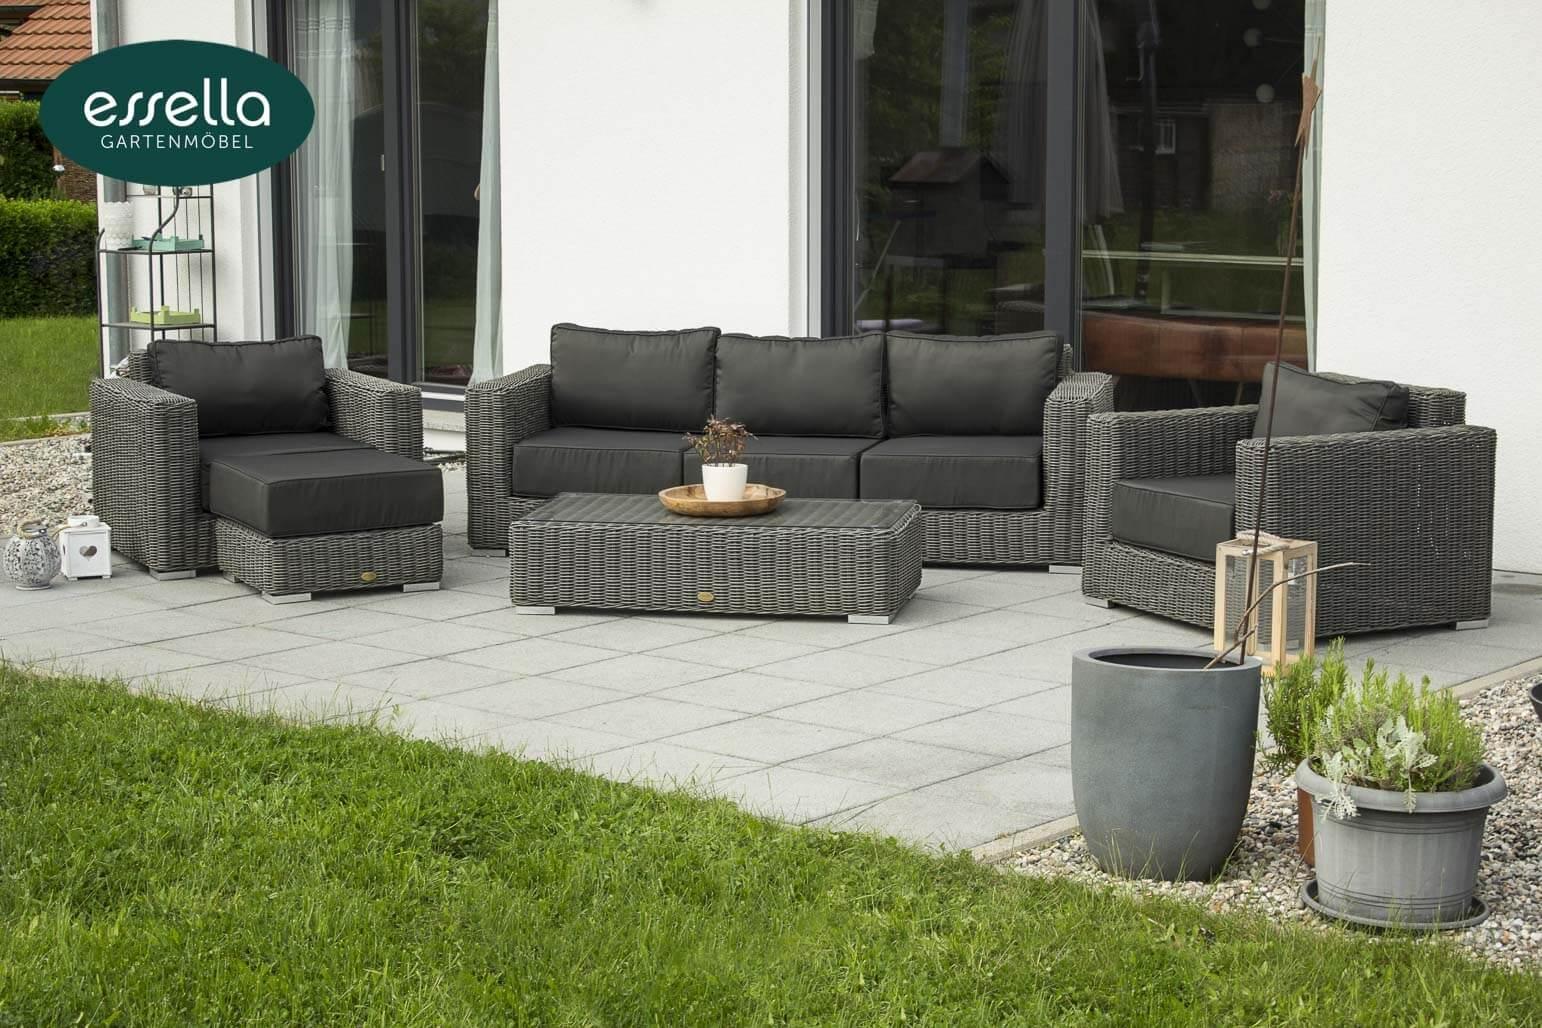 essella polyrattan terrassenm bel lounge monaco rungeflecht. Black Bedroom Furniture Sets. Home Design Ideas